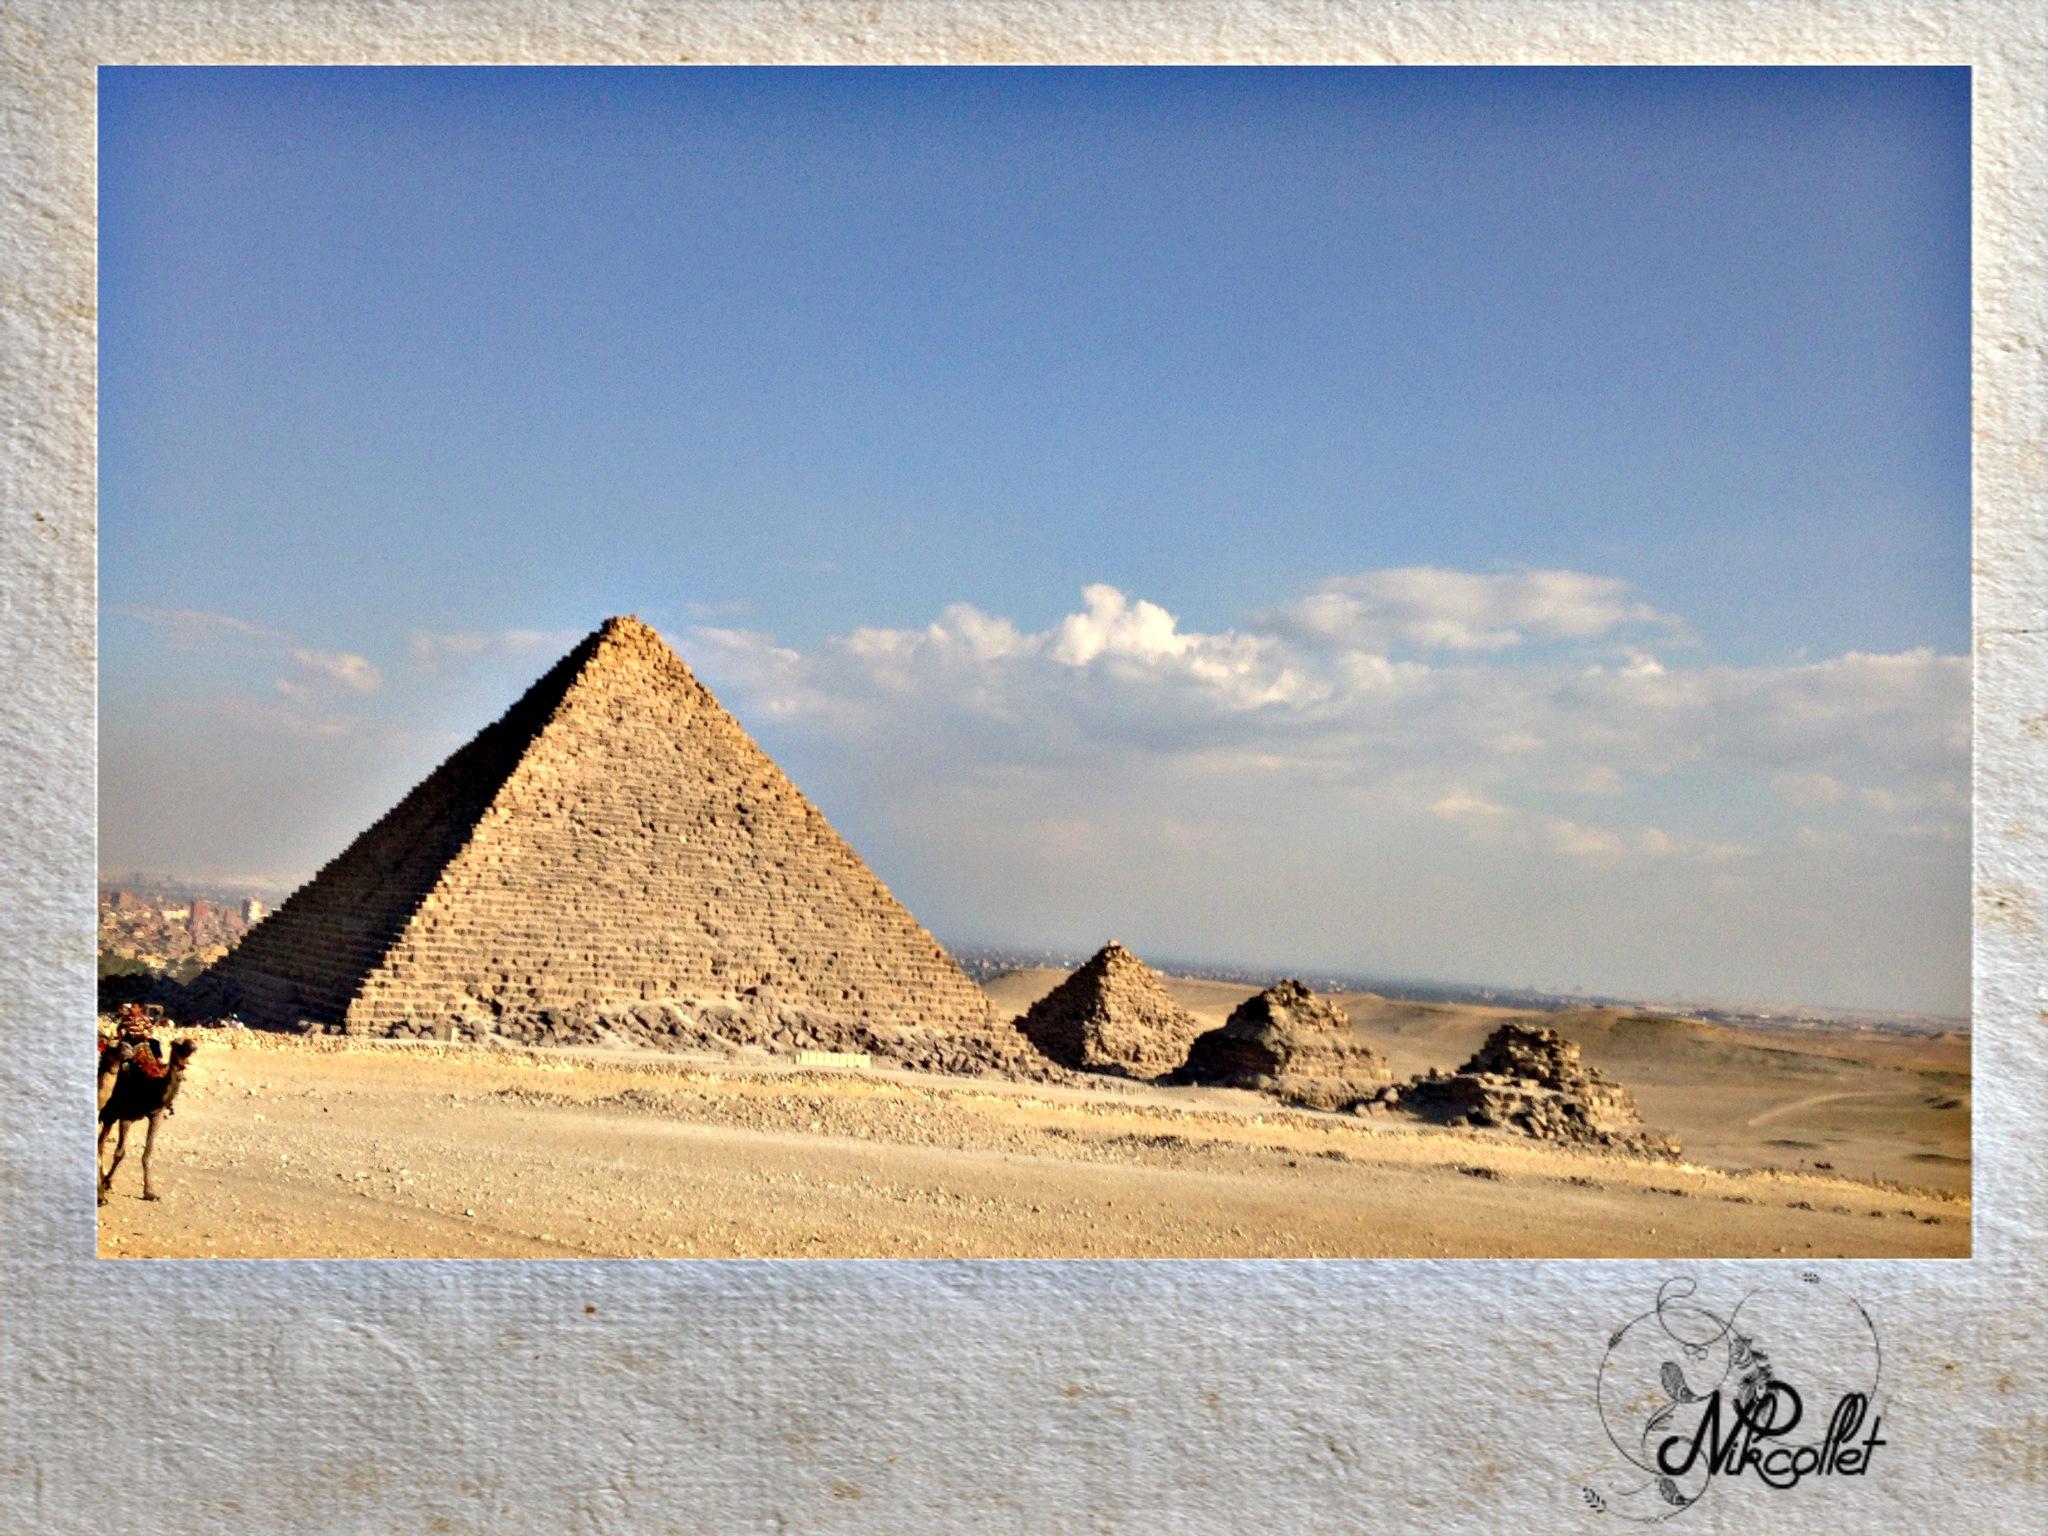 Giza Pyramids by Nikcollet C